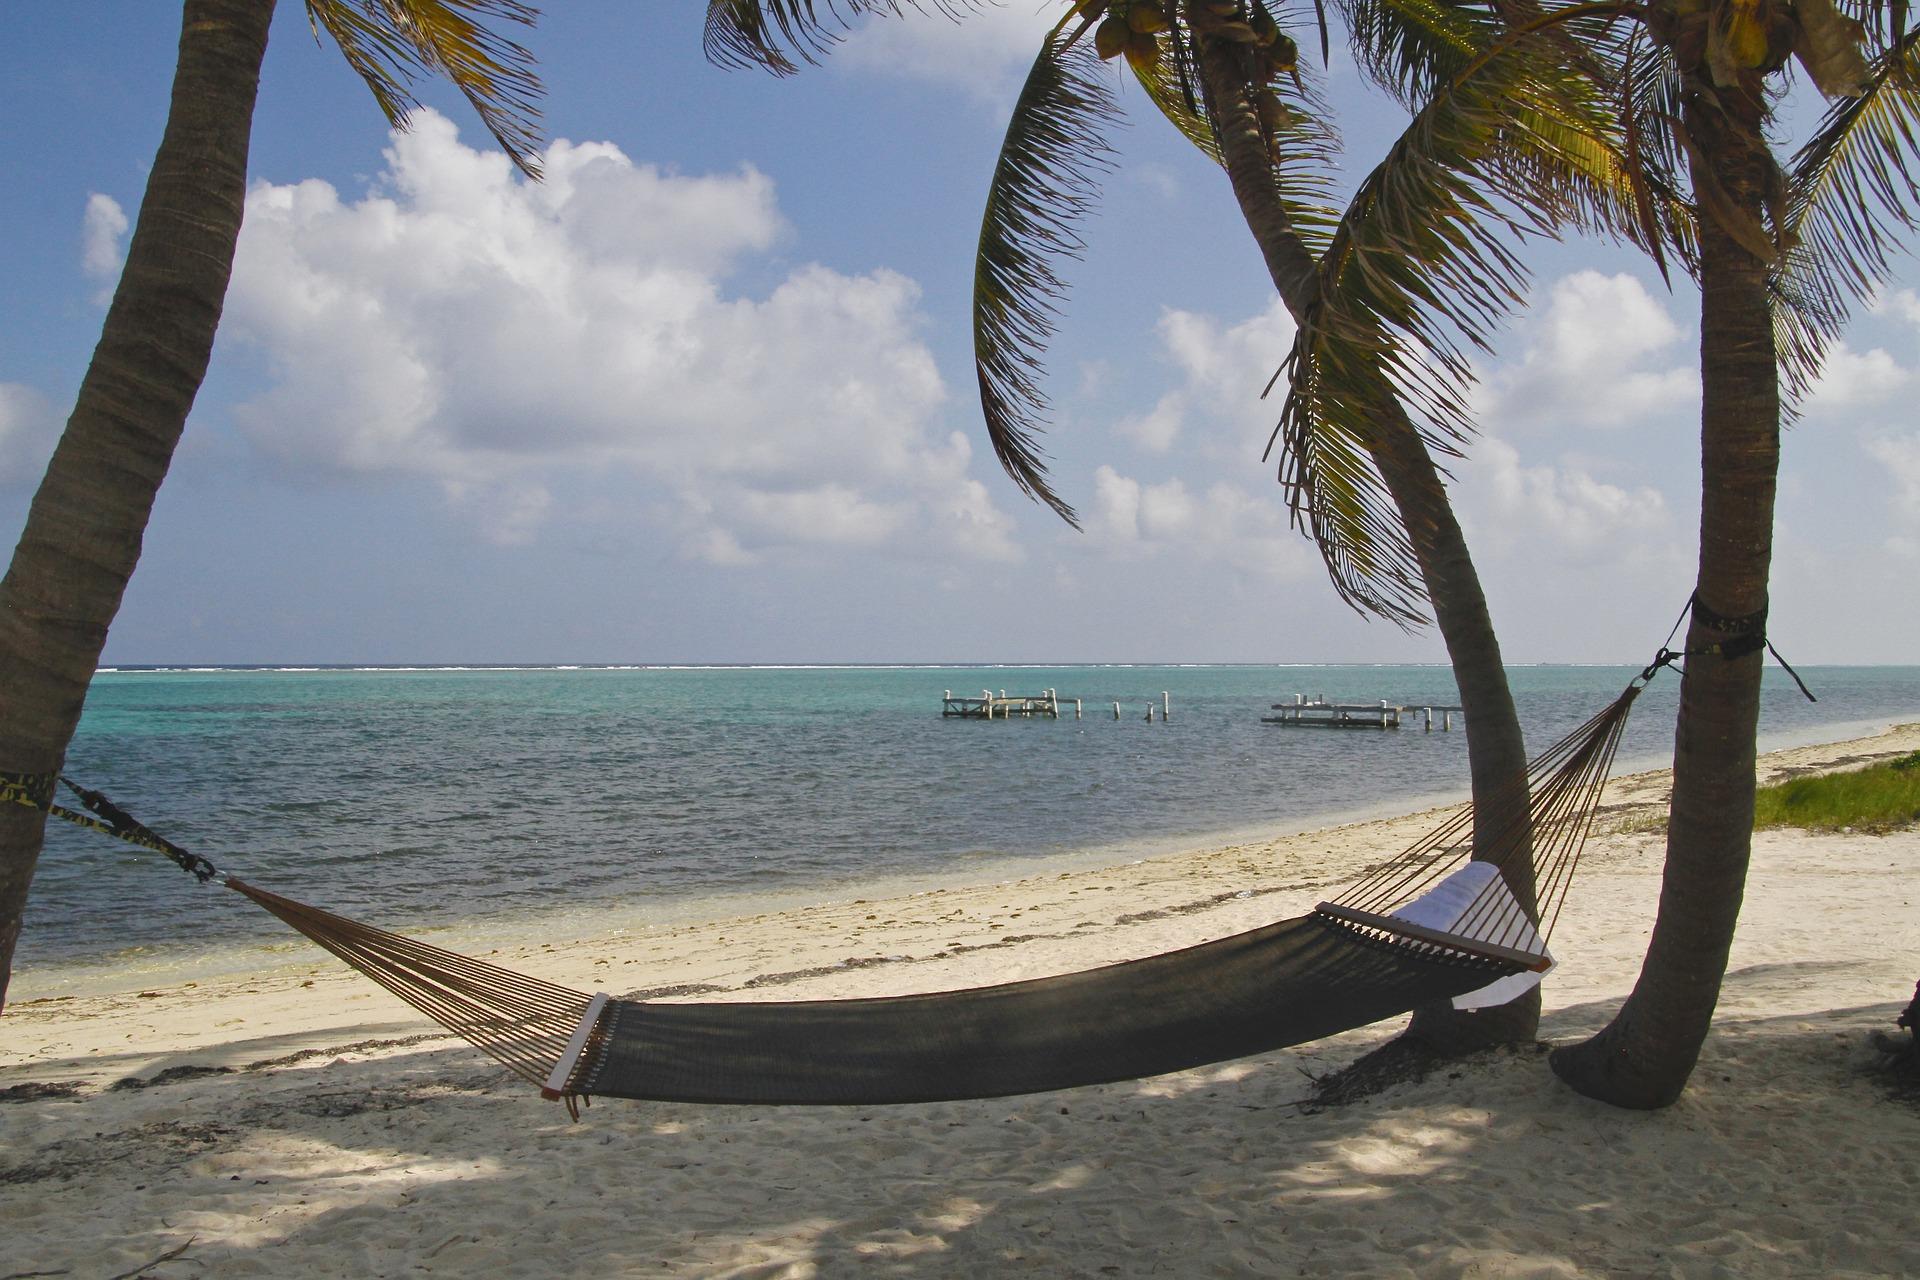 cayman-island-896973_1920